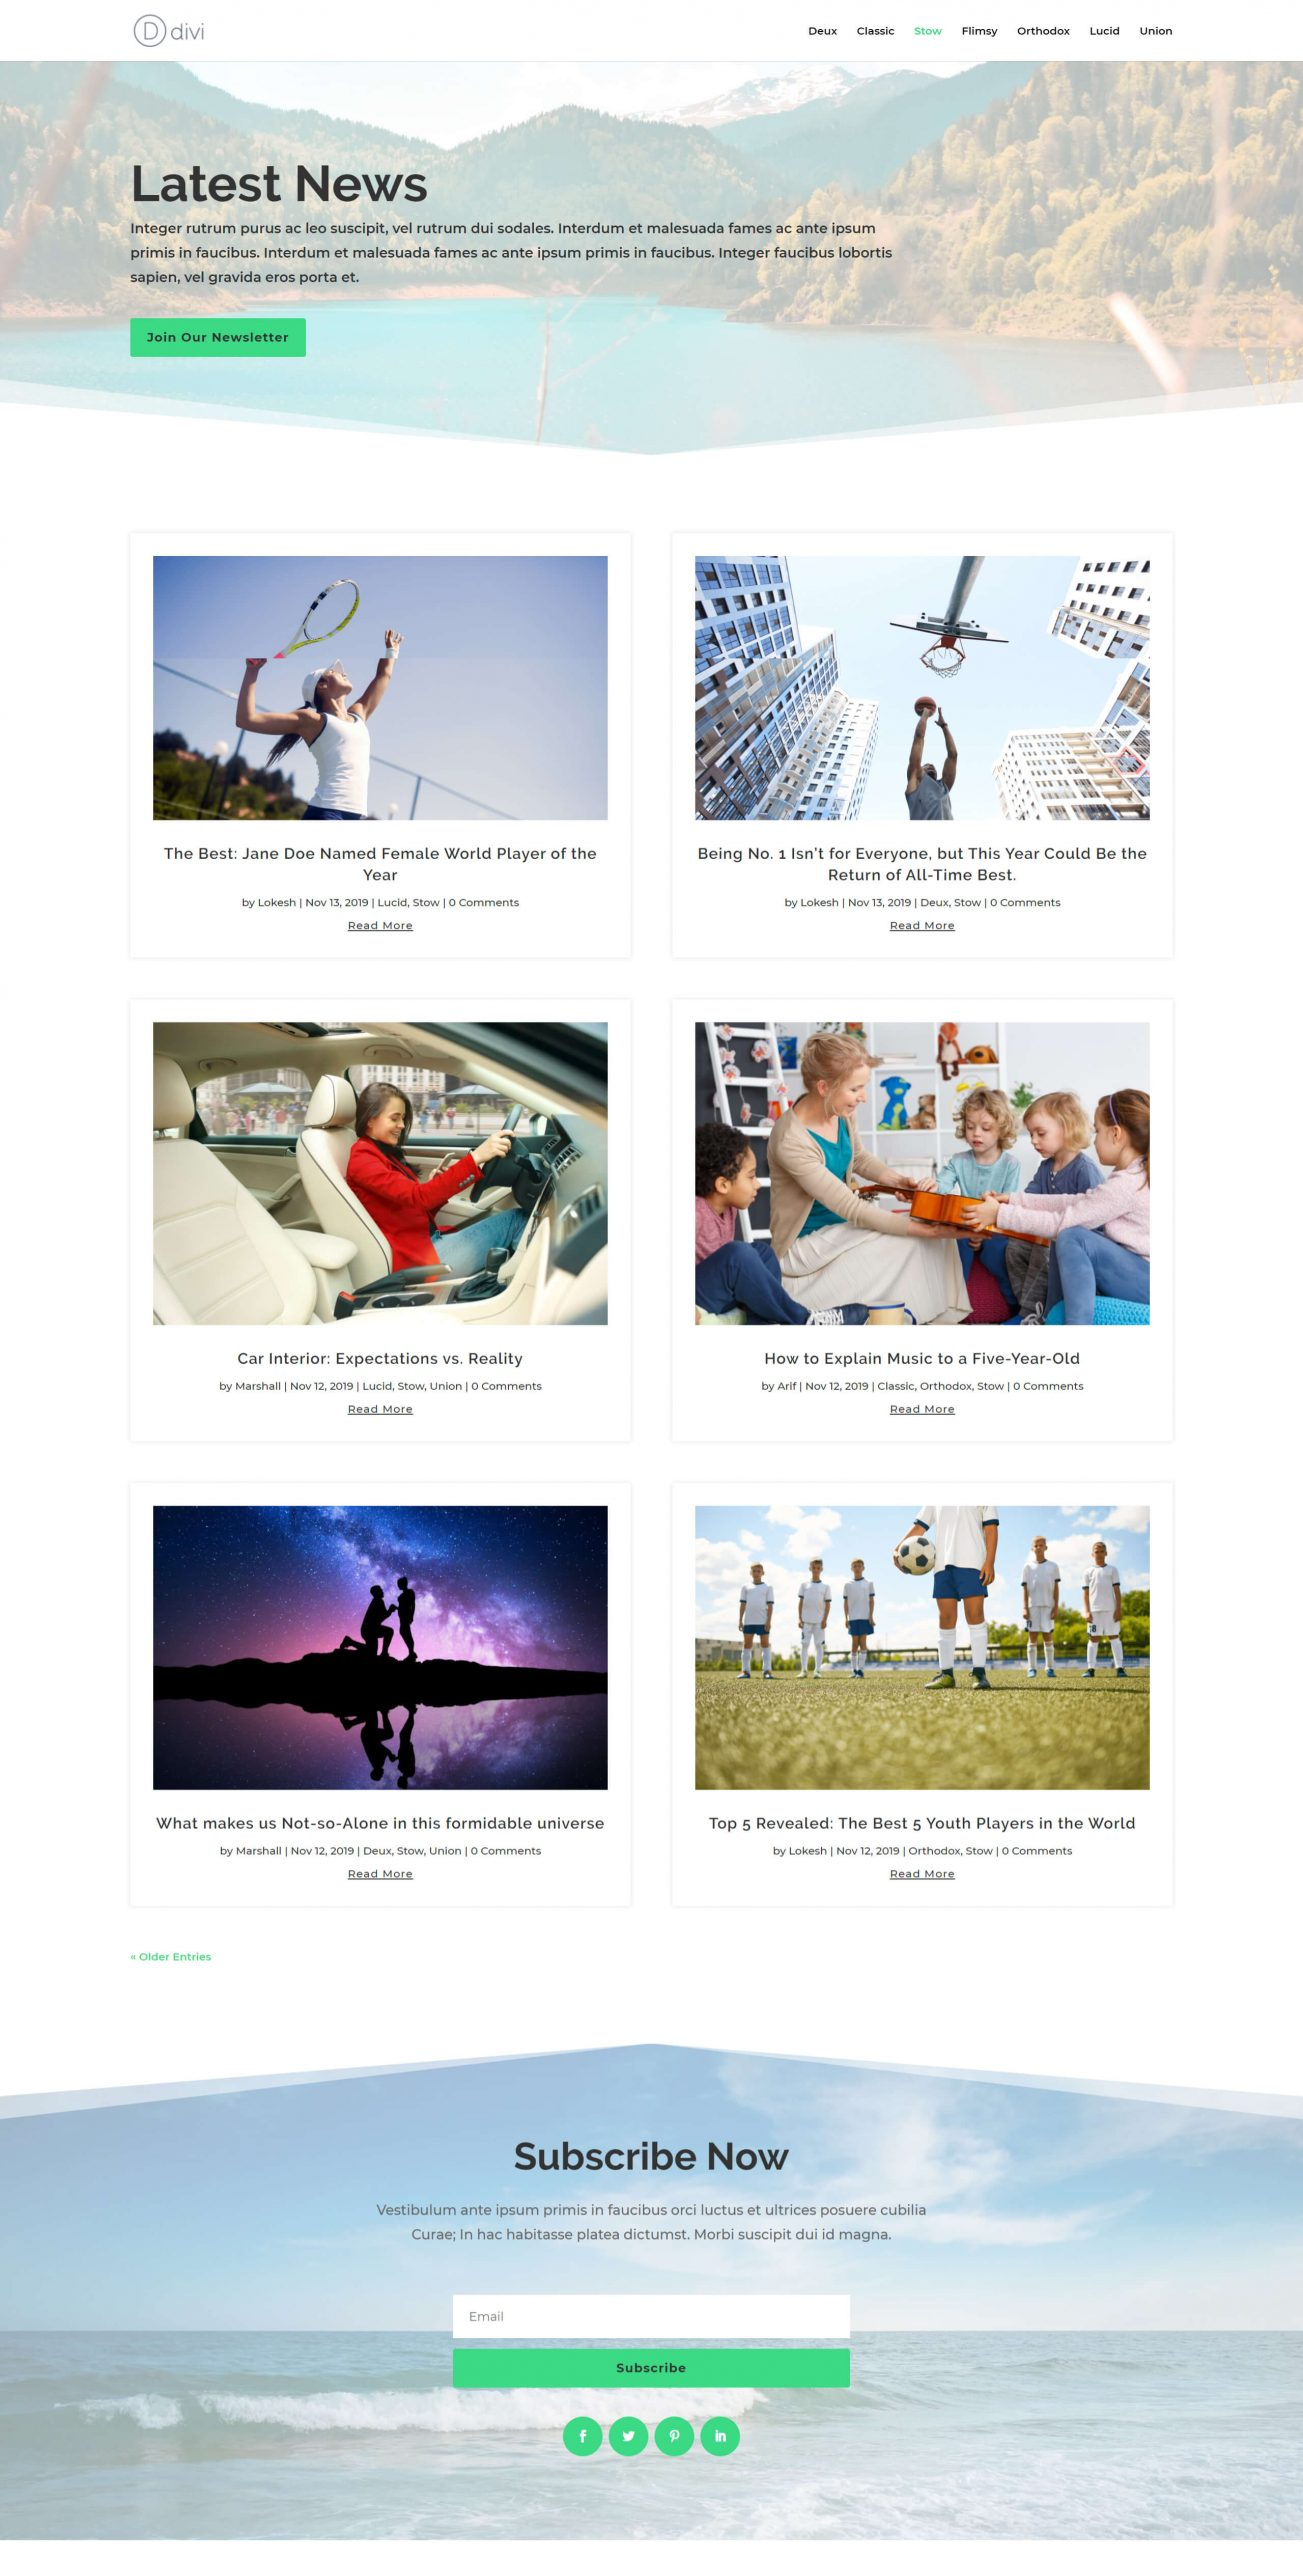 Divi theme blog page layout